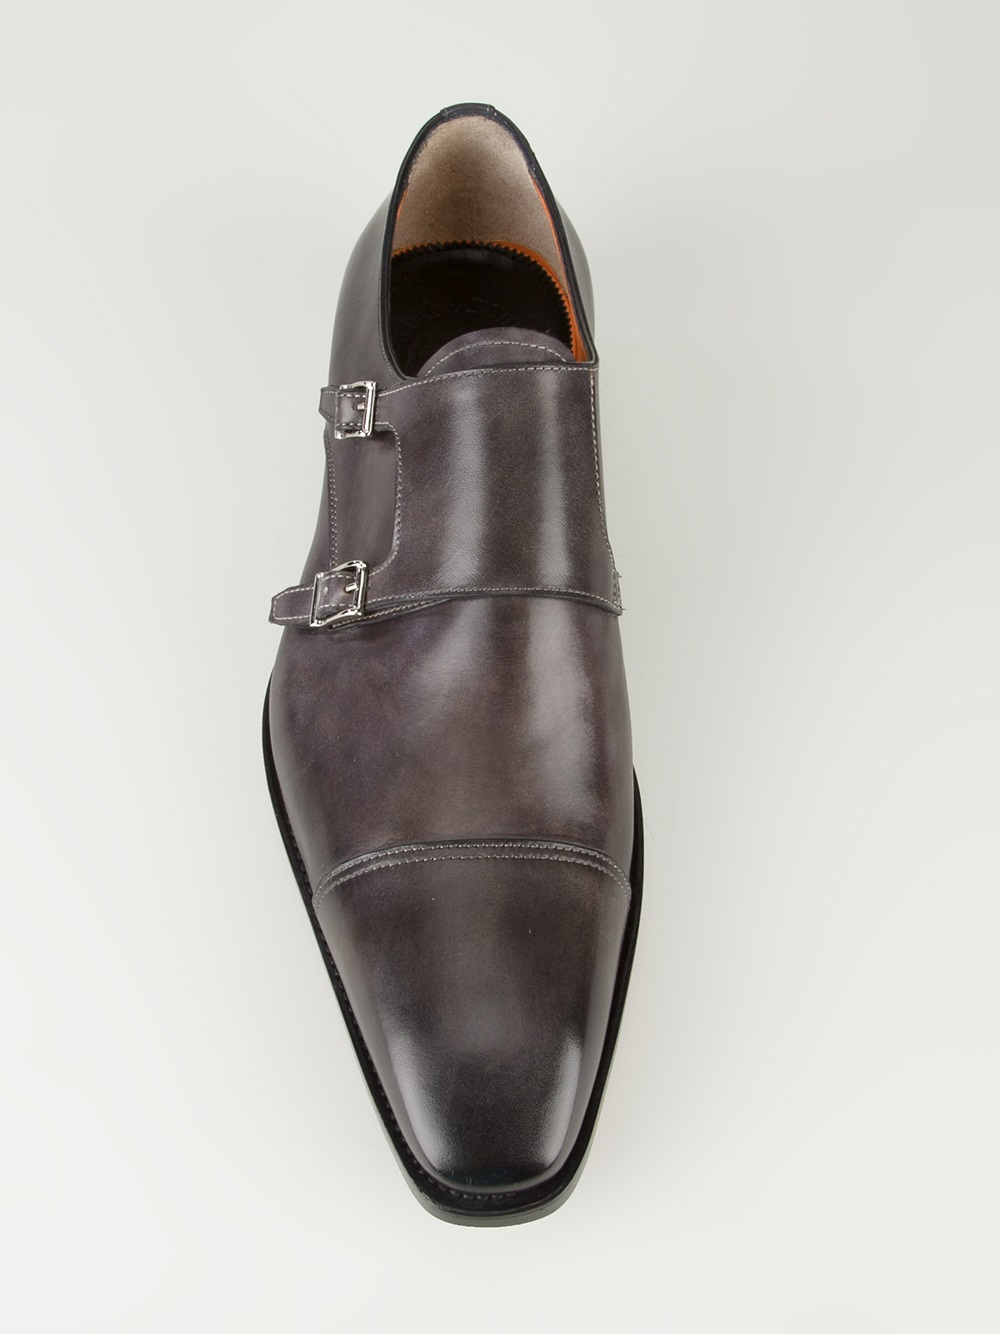 a88b6c7e2ca444 Santoni Double Monk Strap Loafer in Black for Men - Lyst